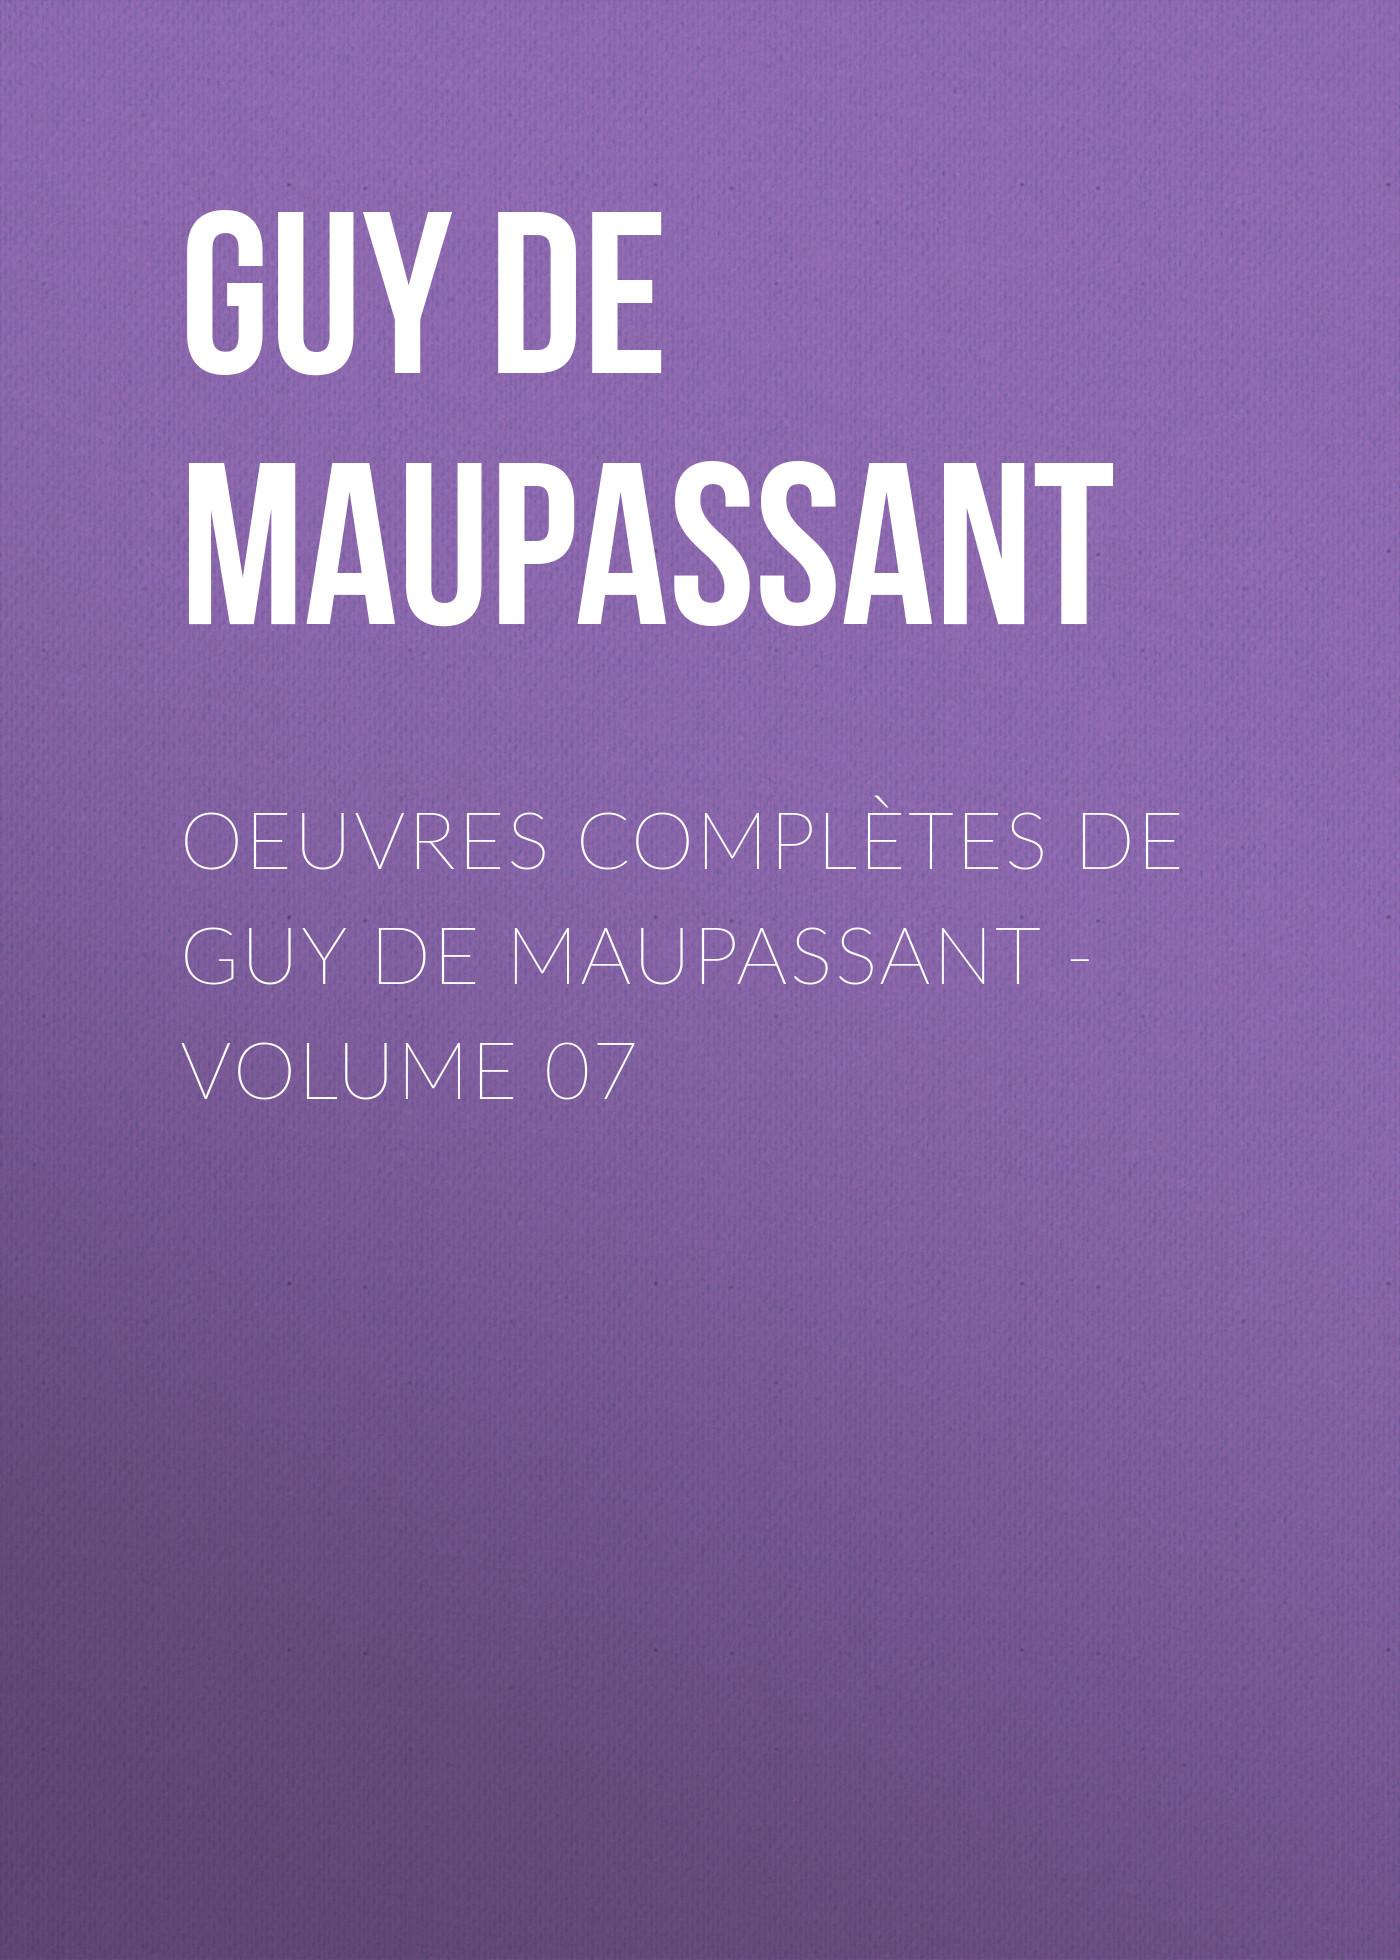 цена на Ги де Мопассан Oeuvres complètes de Guy de Maupassant - volume 07